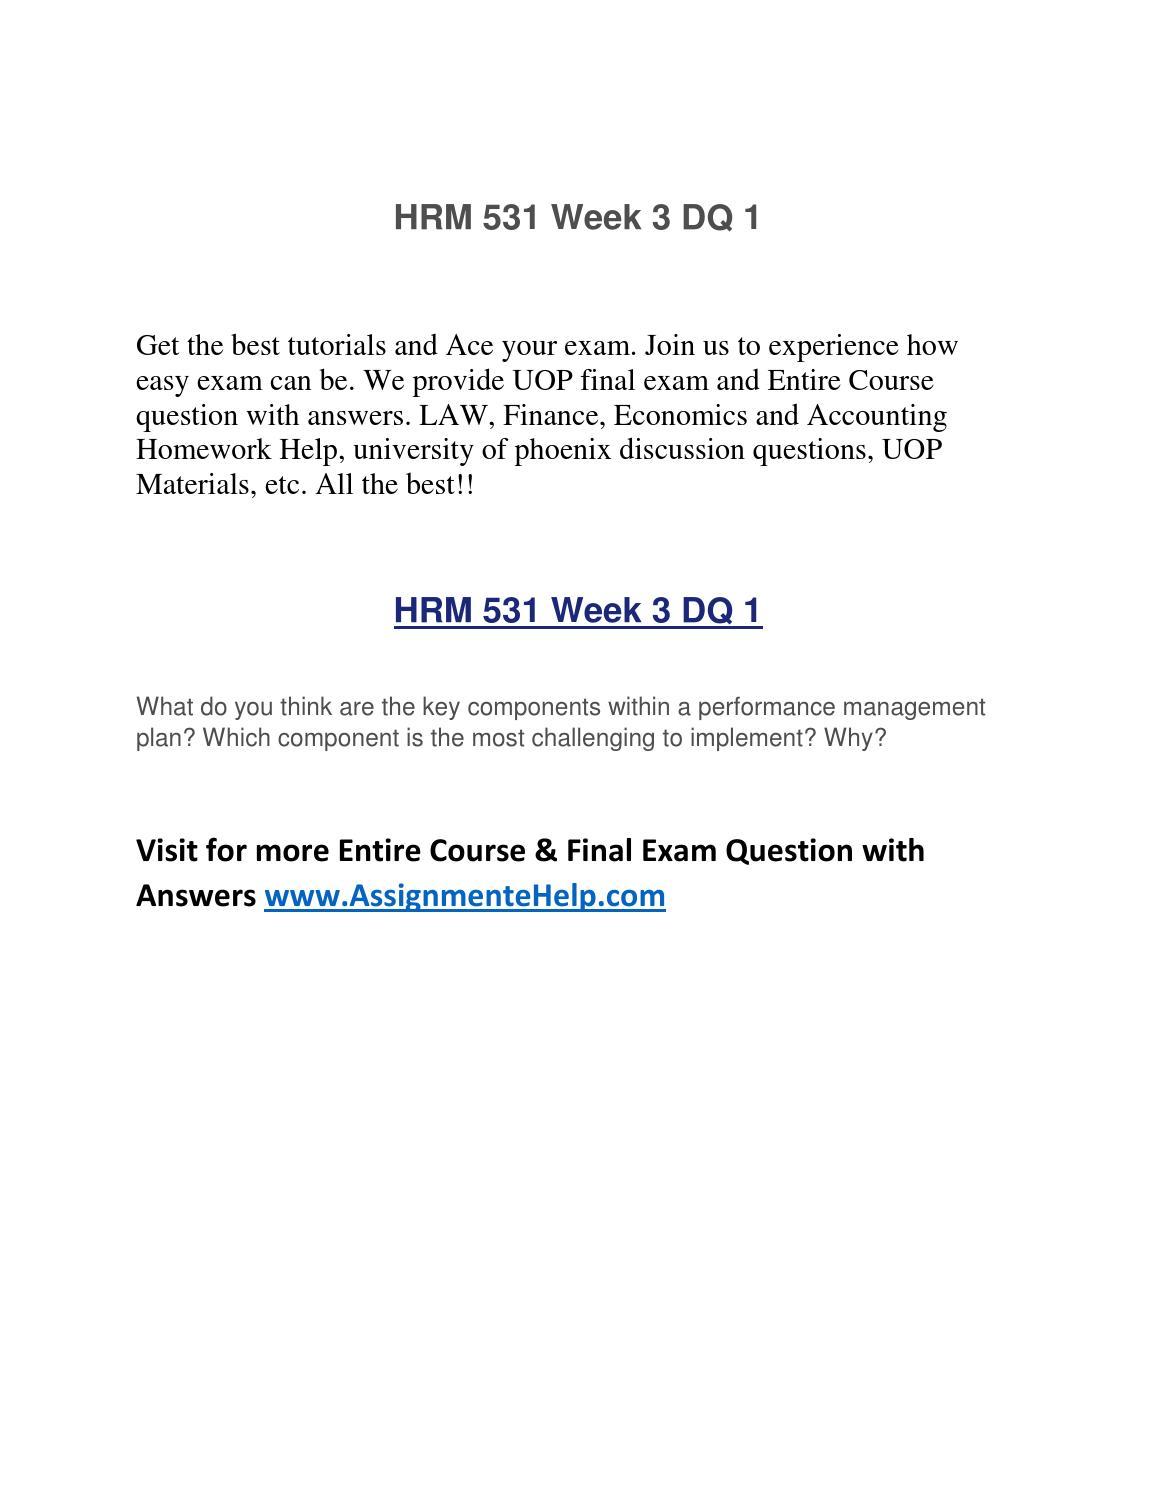 Hrm 531 performance management plan